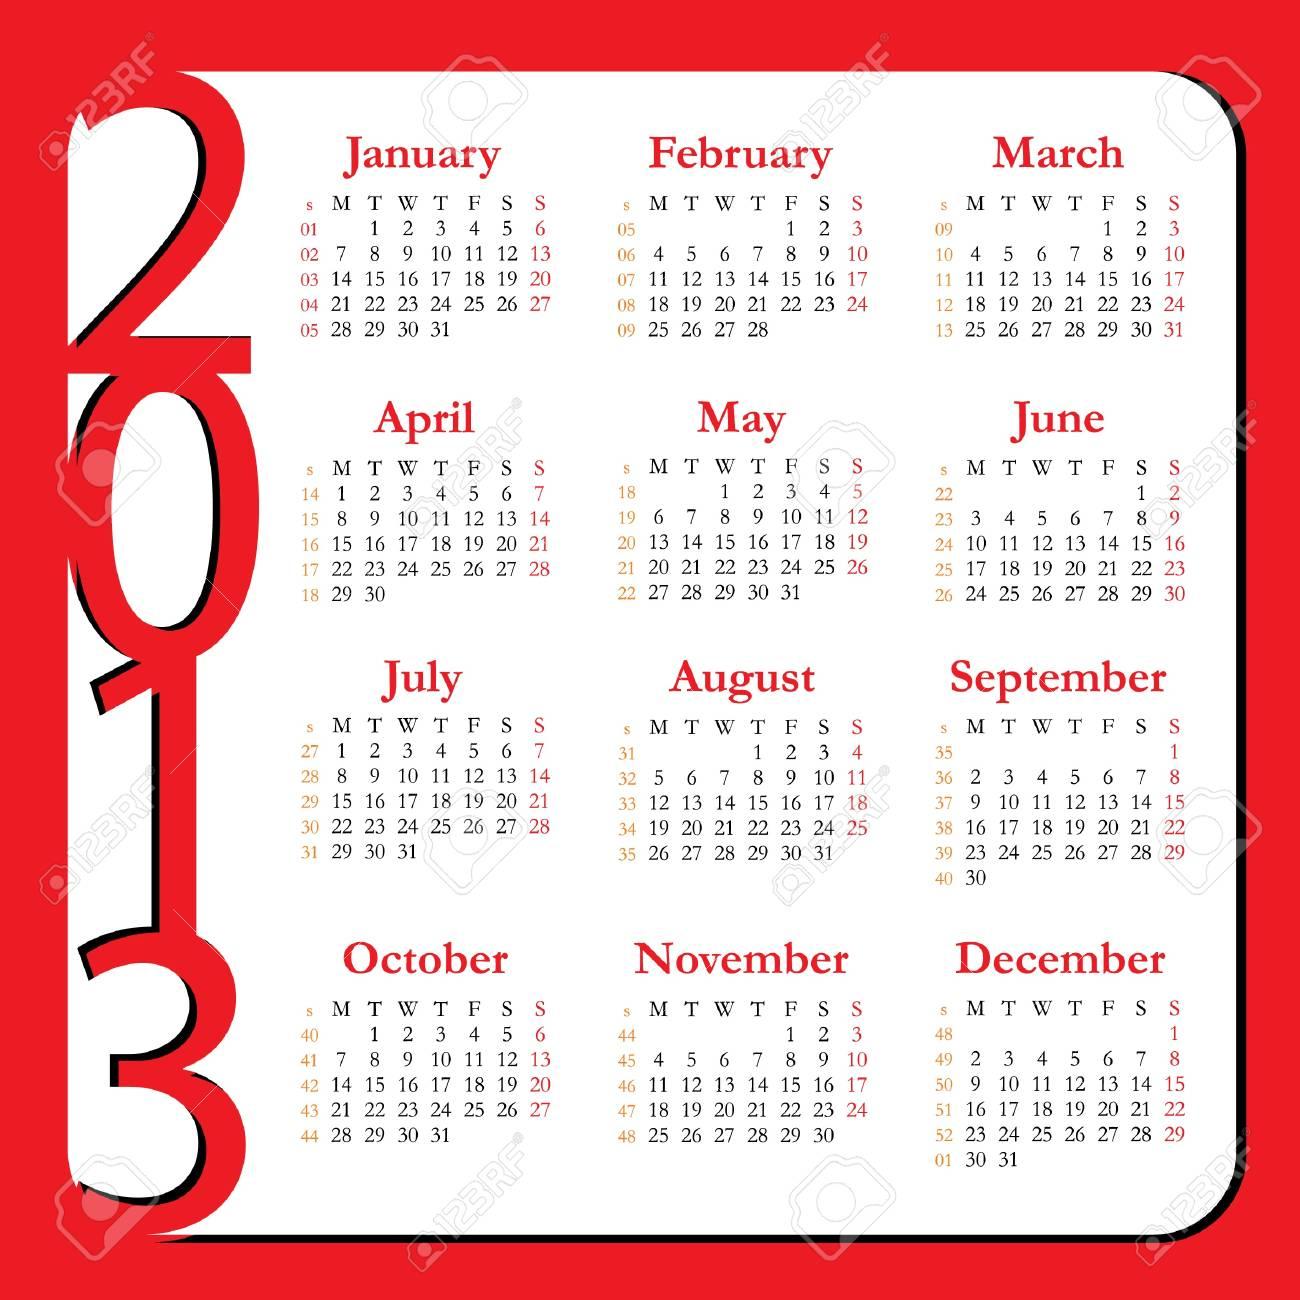 Calendar for Year 2013 Stock Vector - 14150977